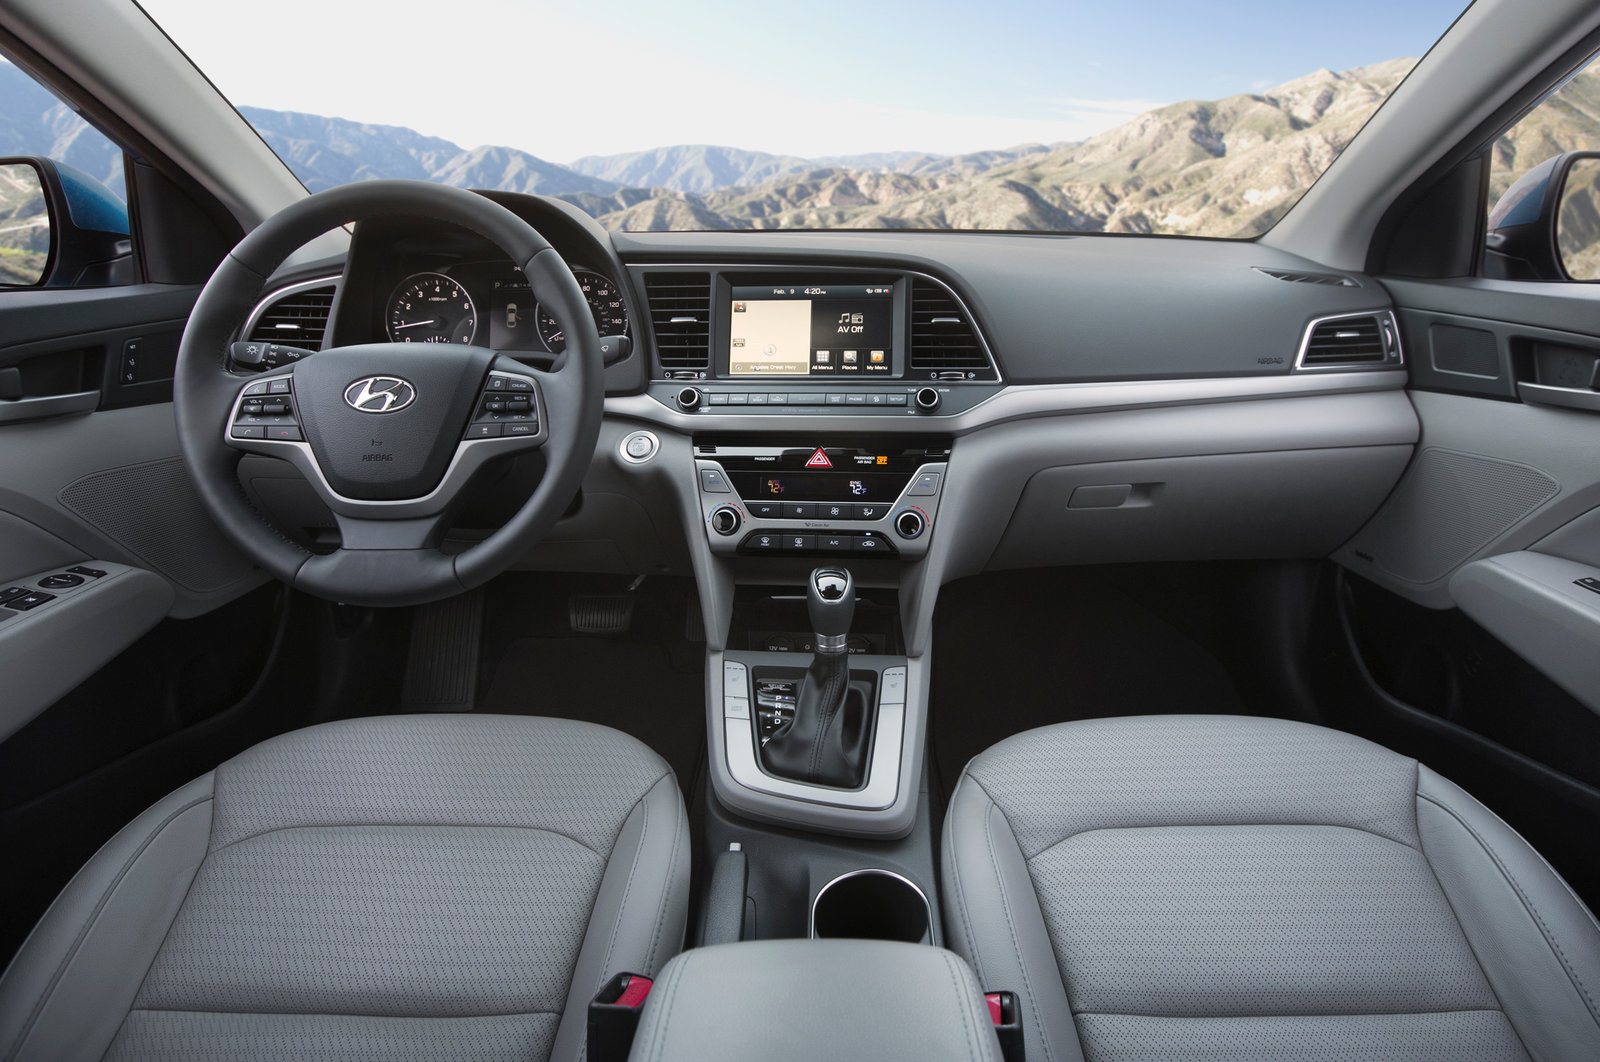 Hyundai Elantra Хендай Элантра 2017 года фото новой